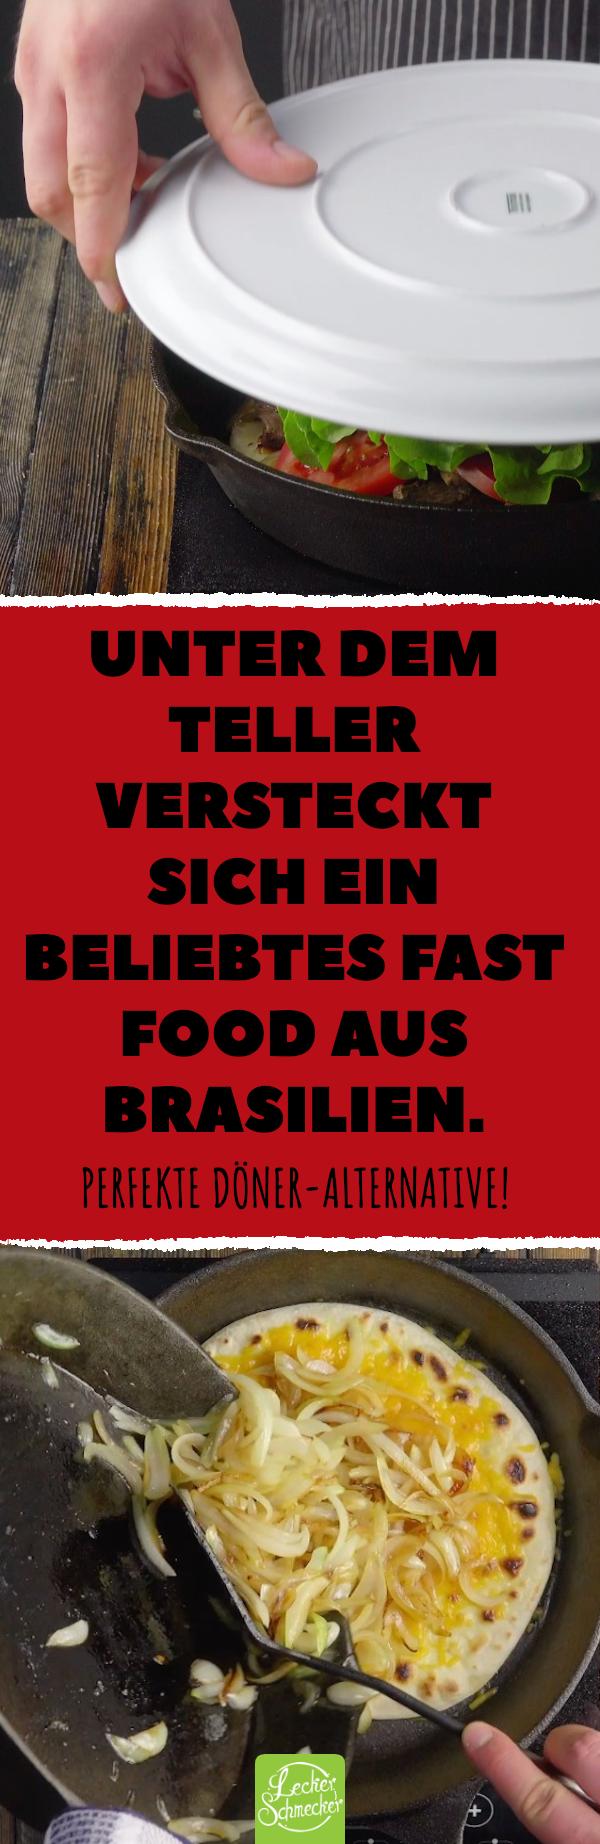 Unter dem Teller versteckt sich ein beliebtes Fast Food aus Brasilien. Perfekte Döner-Alternative! #rezept #lecker #beirut #sandwich #fladenbrot #fastfood #apfelrosenblätterteig